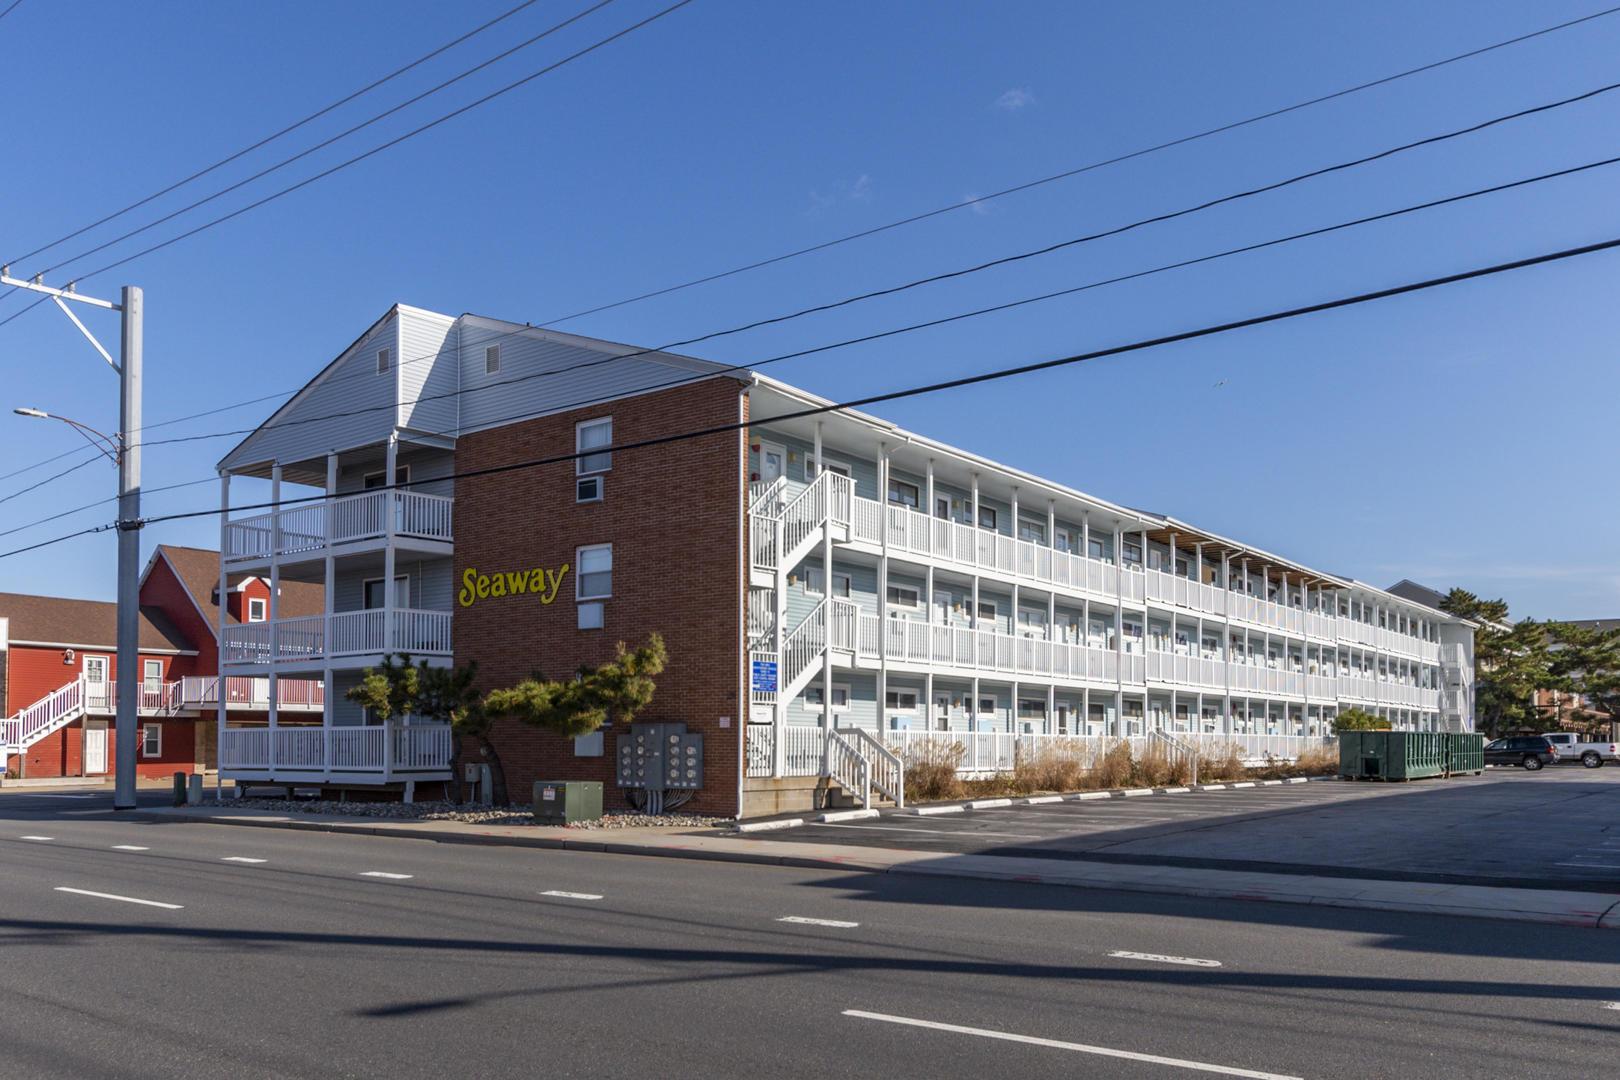 Seaway 21 - Exterior of Building